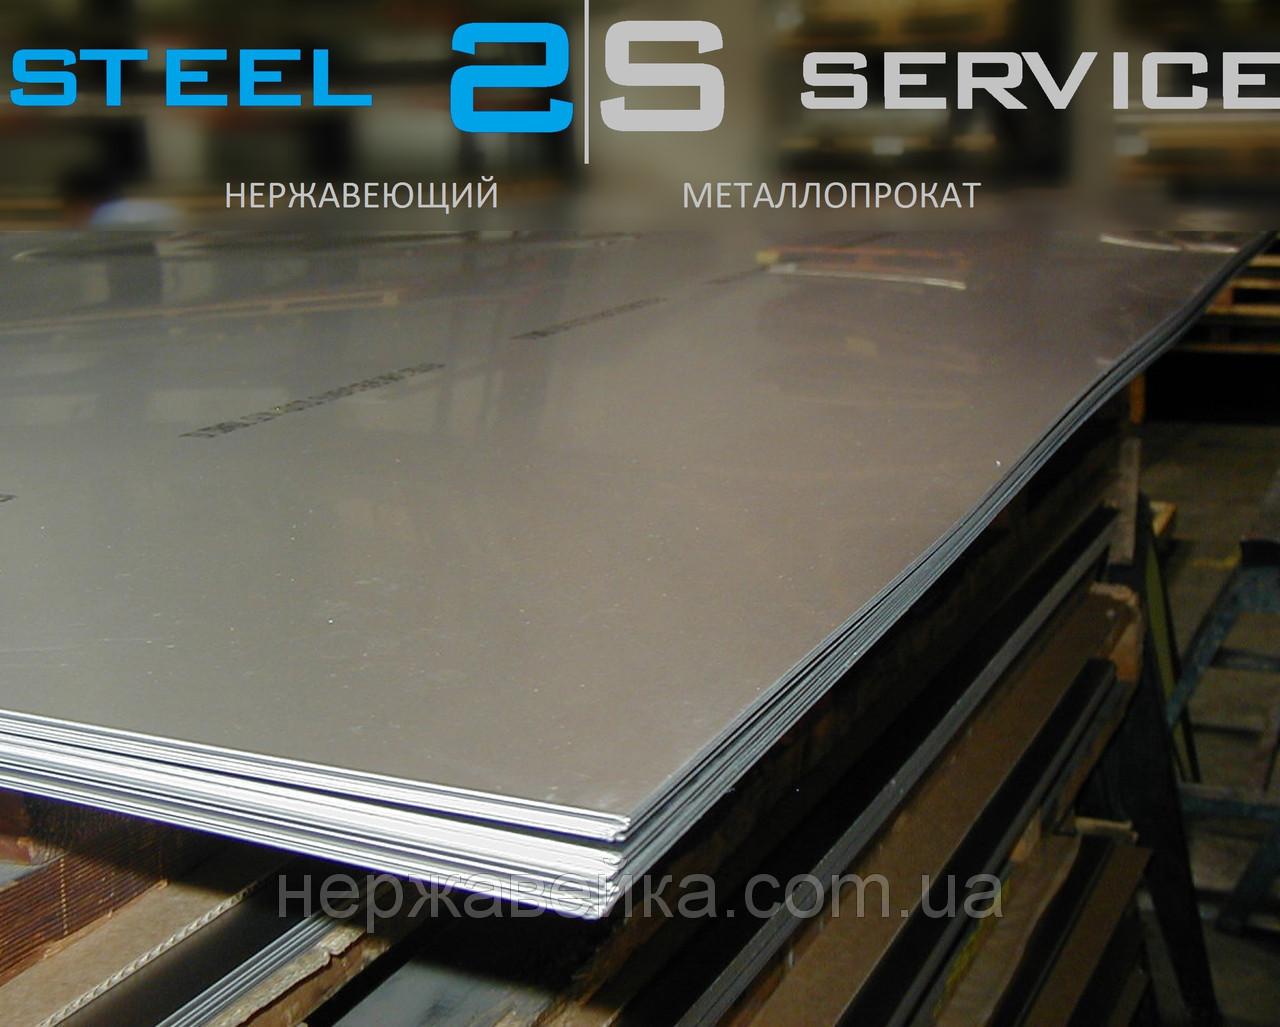 Нержавеющий лист 14х1250х2500мм  AISI 316L(03Х17Н14М3) F1 - горячекатанный,  кислотостойкий